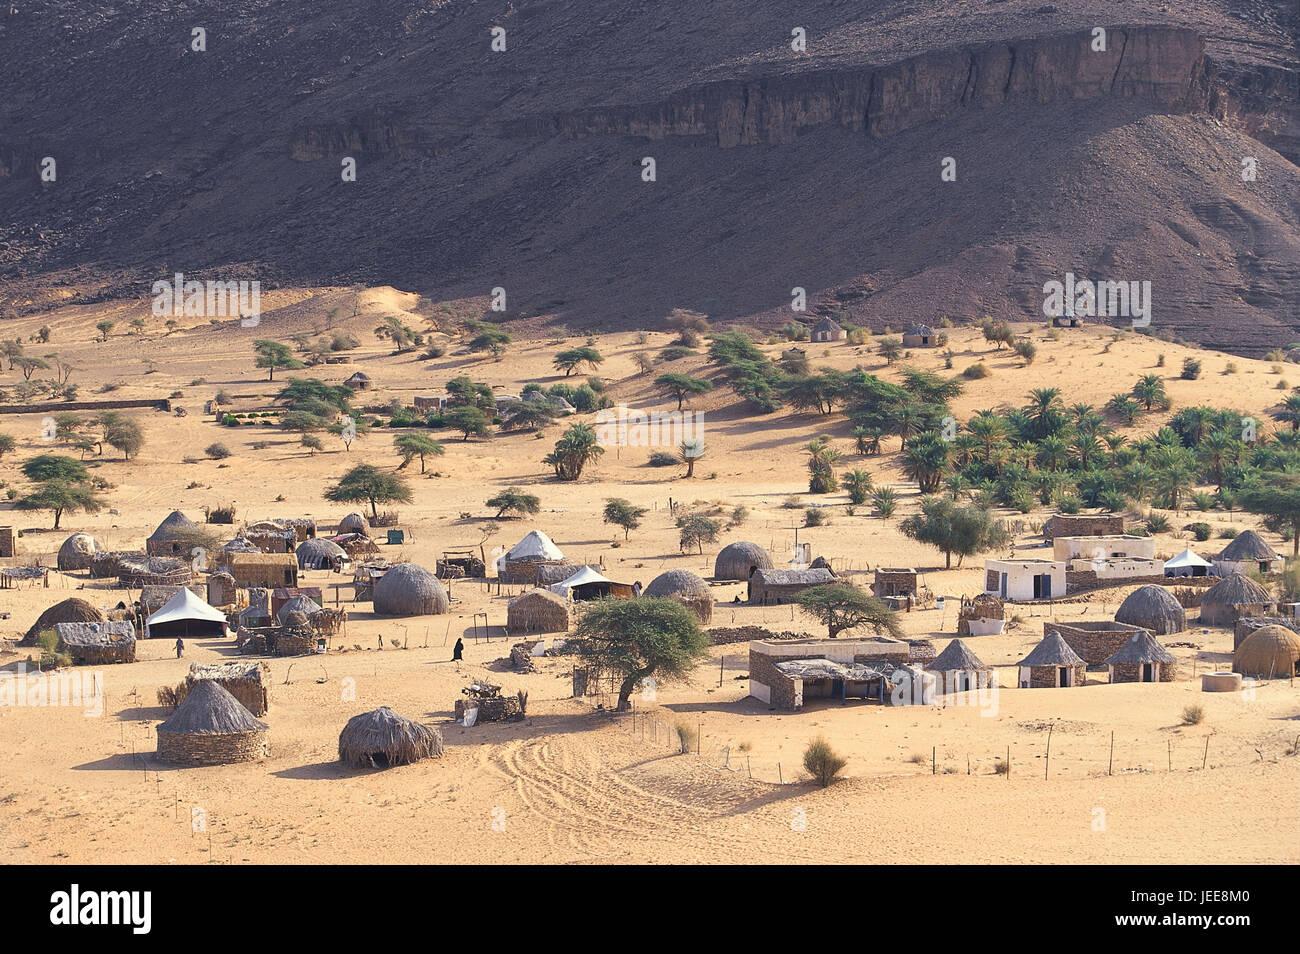 Mauritania, wild settlement, oasis Terjiit, Africa, West Africa, desert, settlement, village, houses, steelworks, - Stock Image